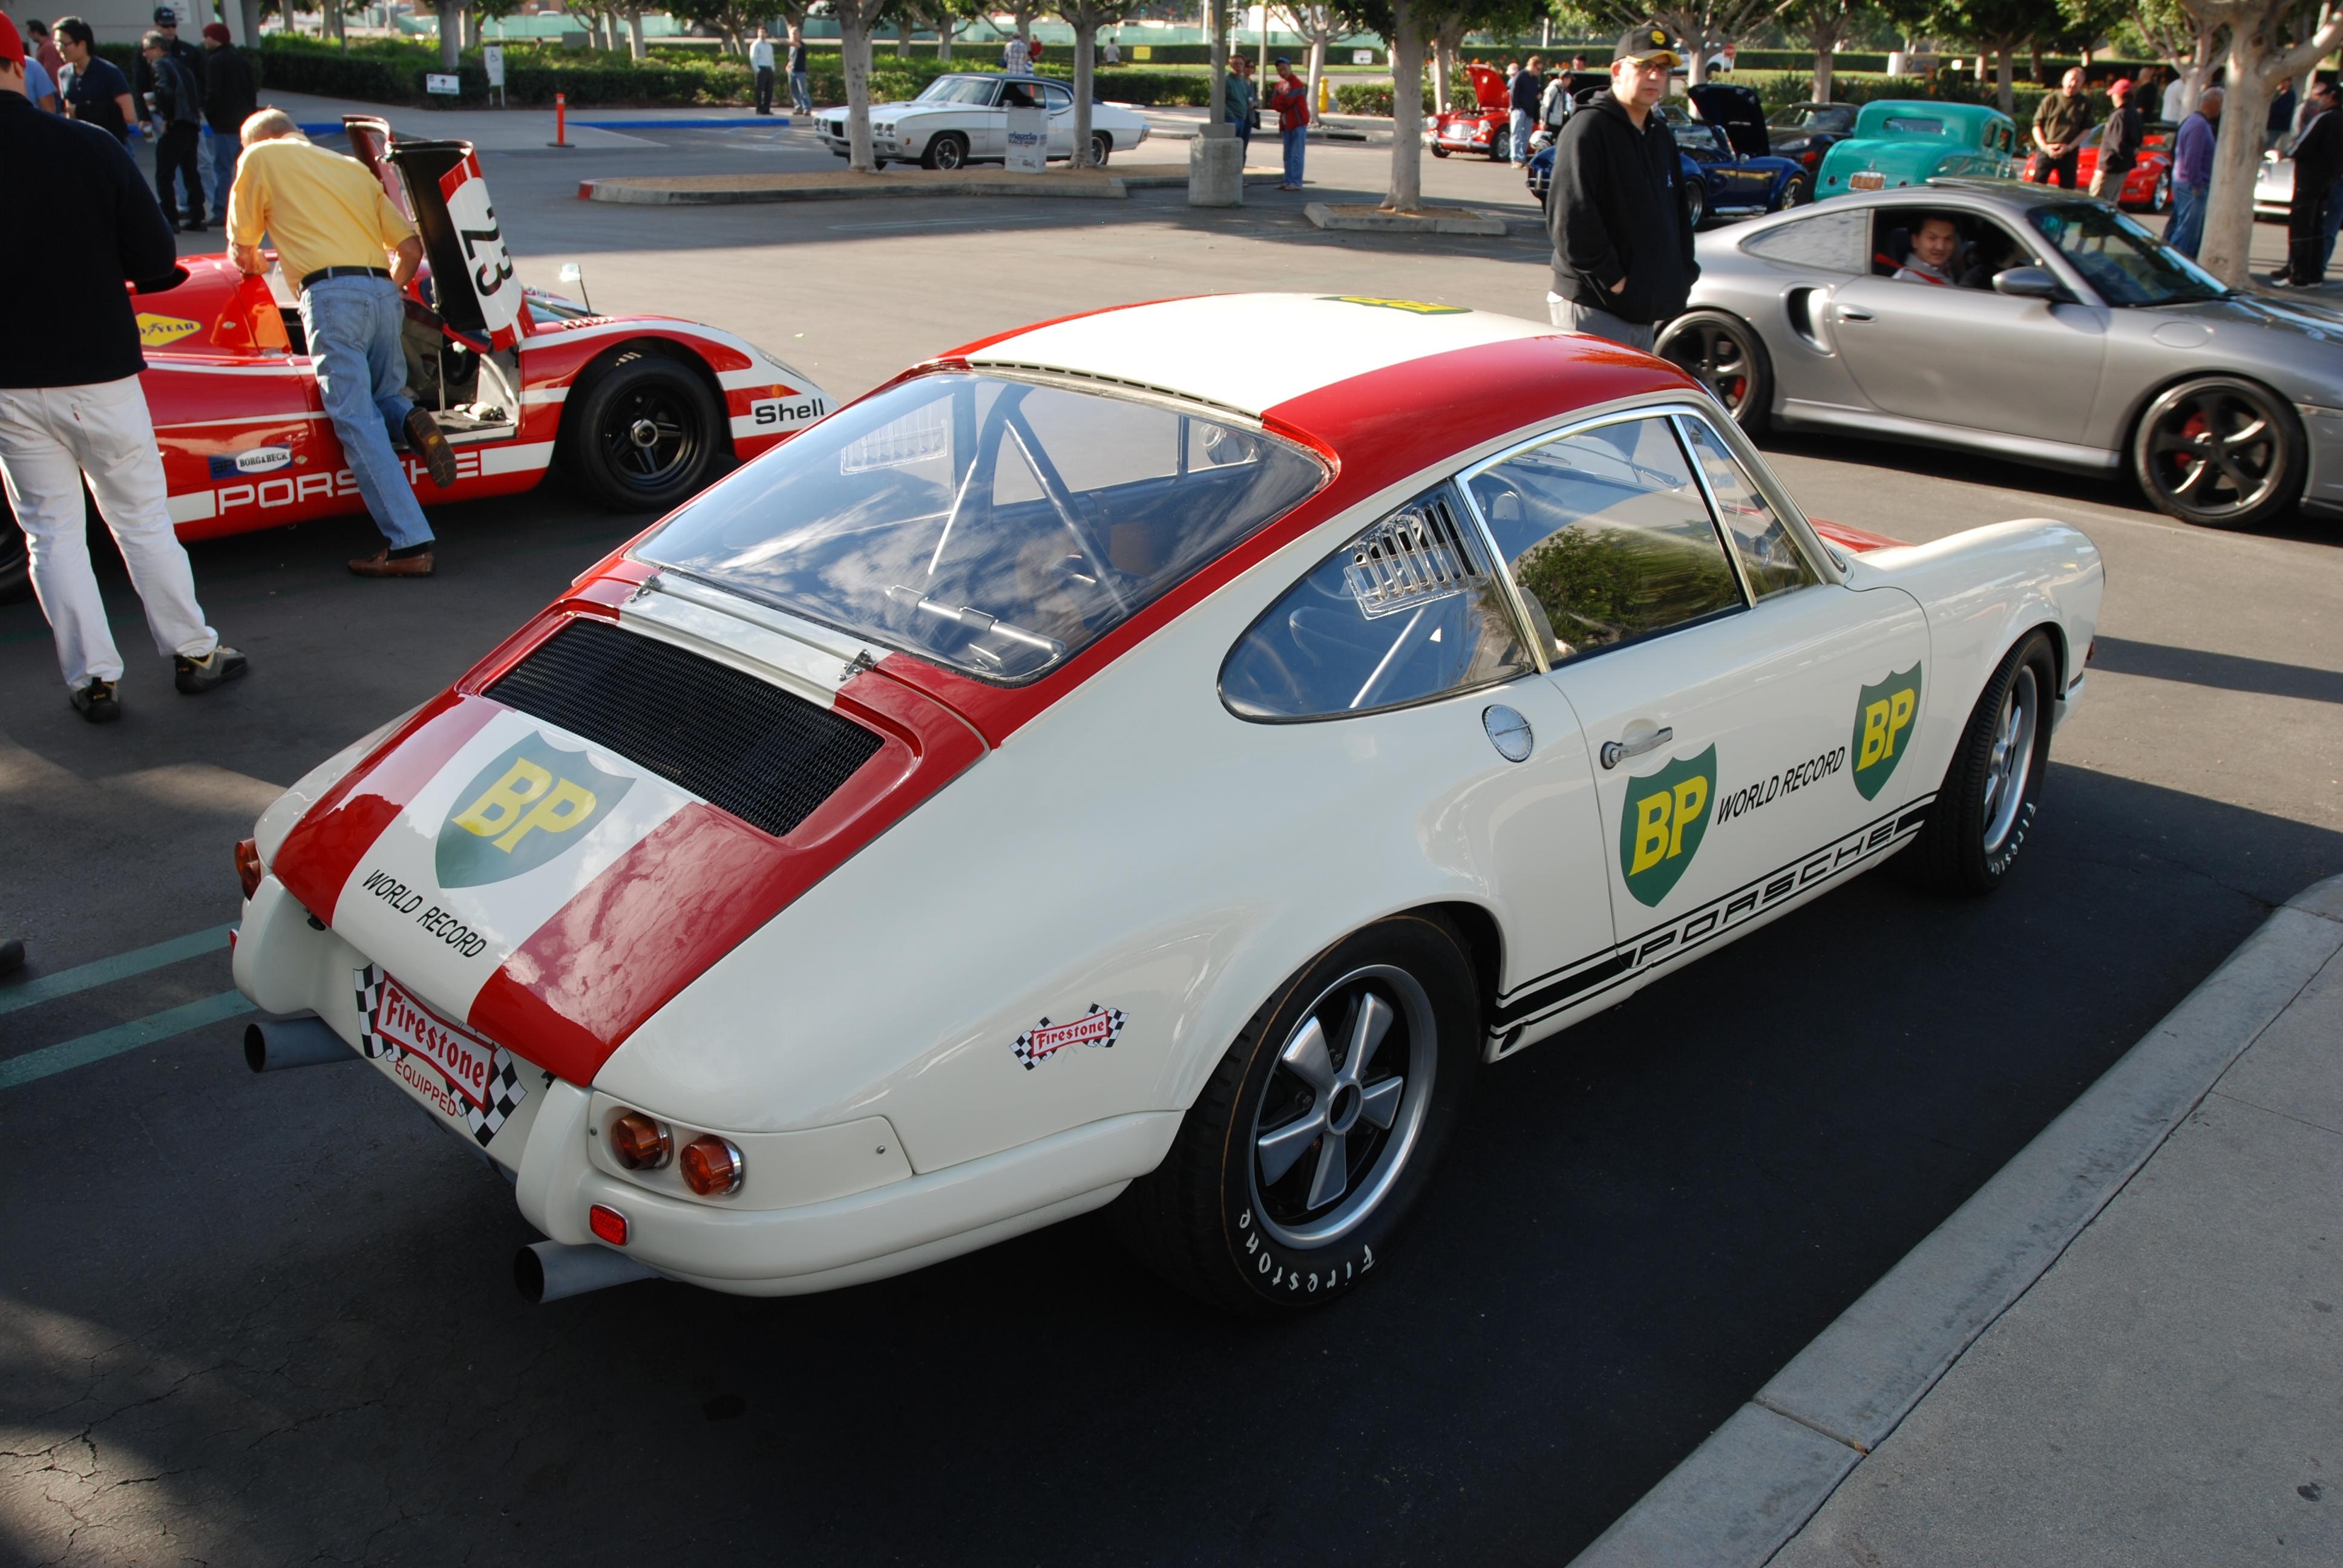 1967 Porsche 911R | digitaldtour